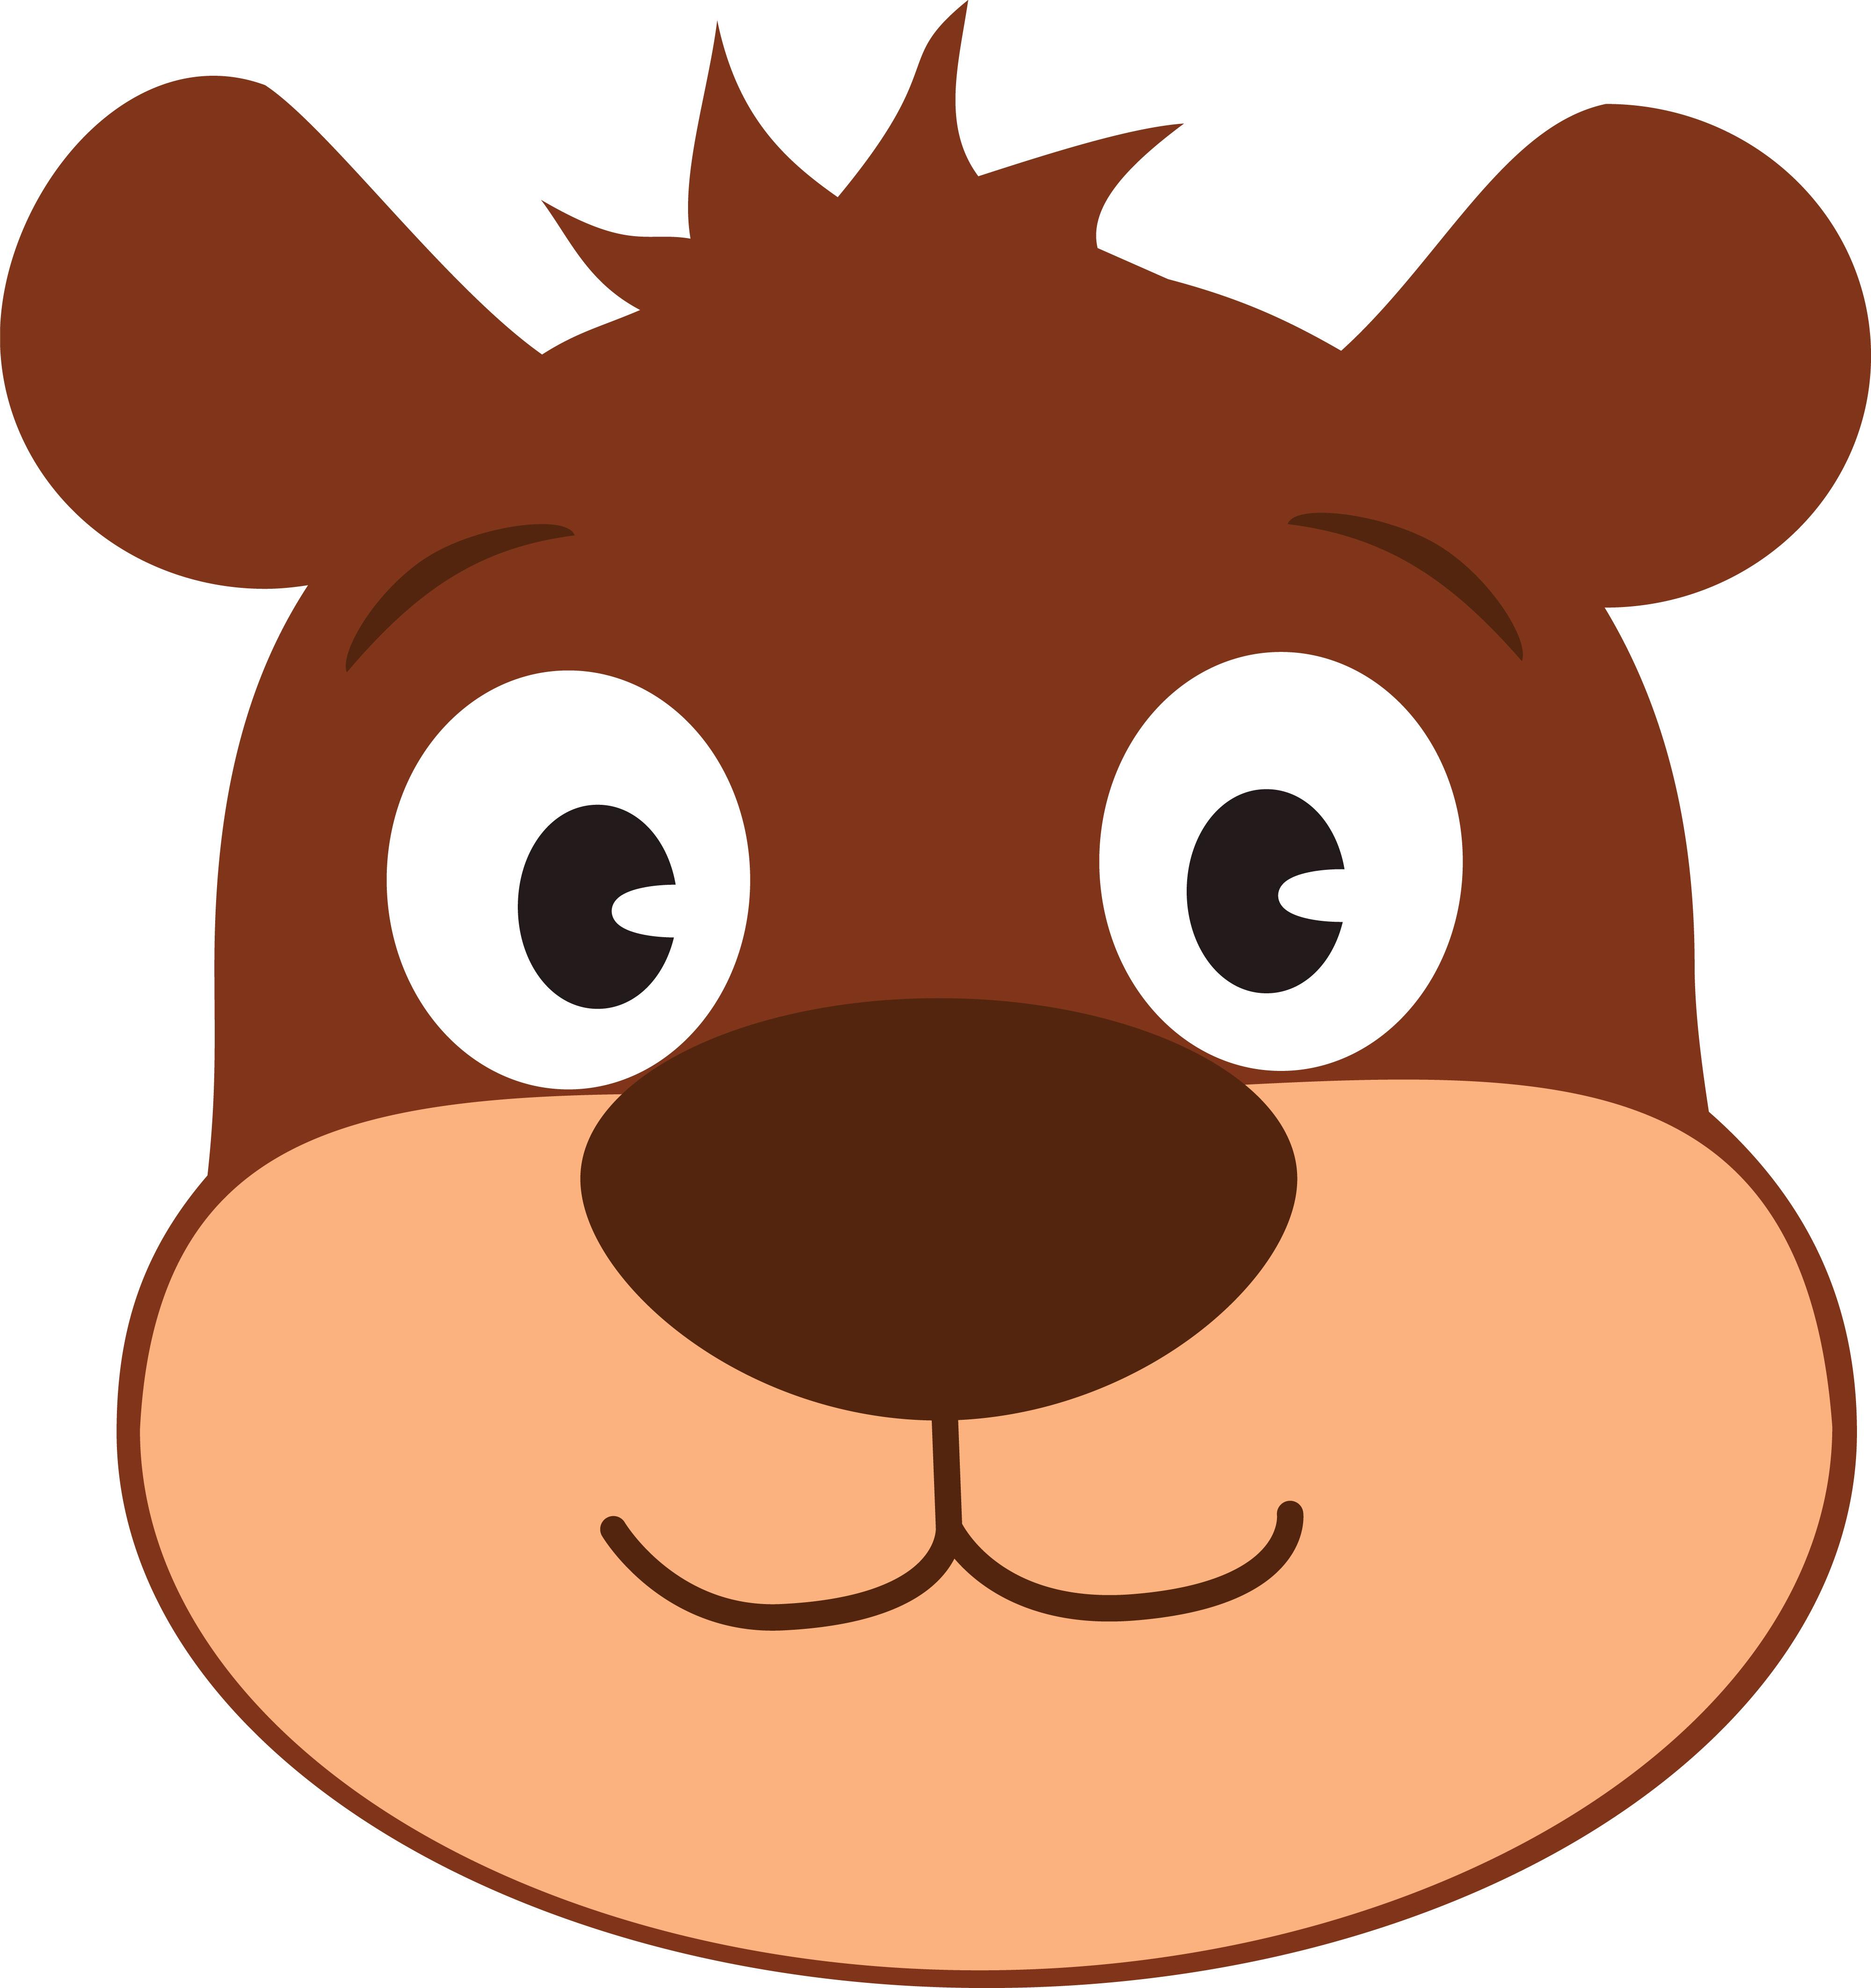 Free Clipart Of A Cute Bear Face